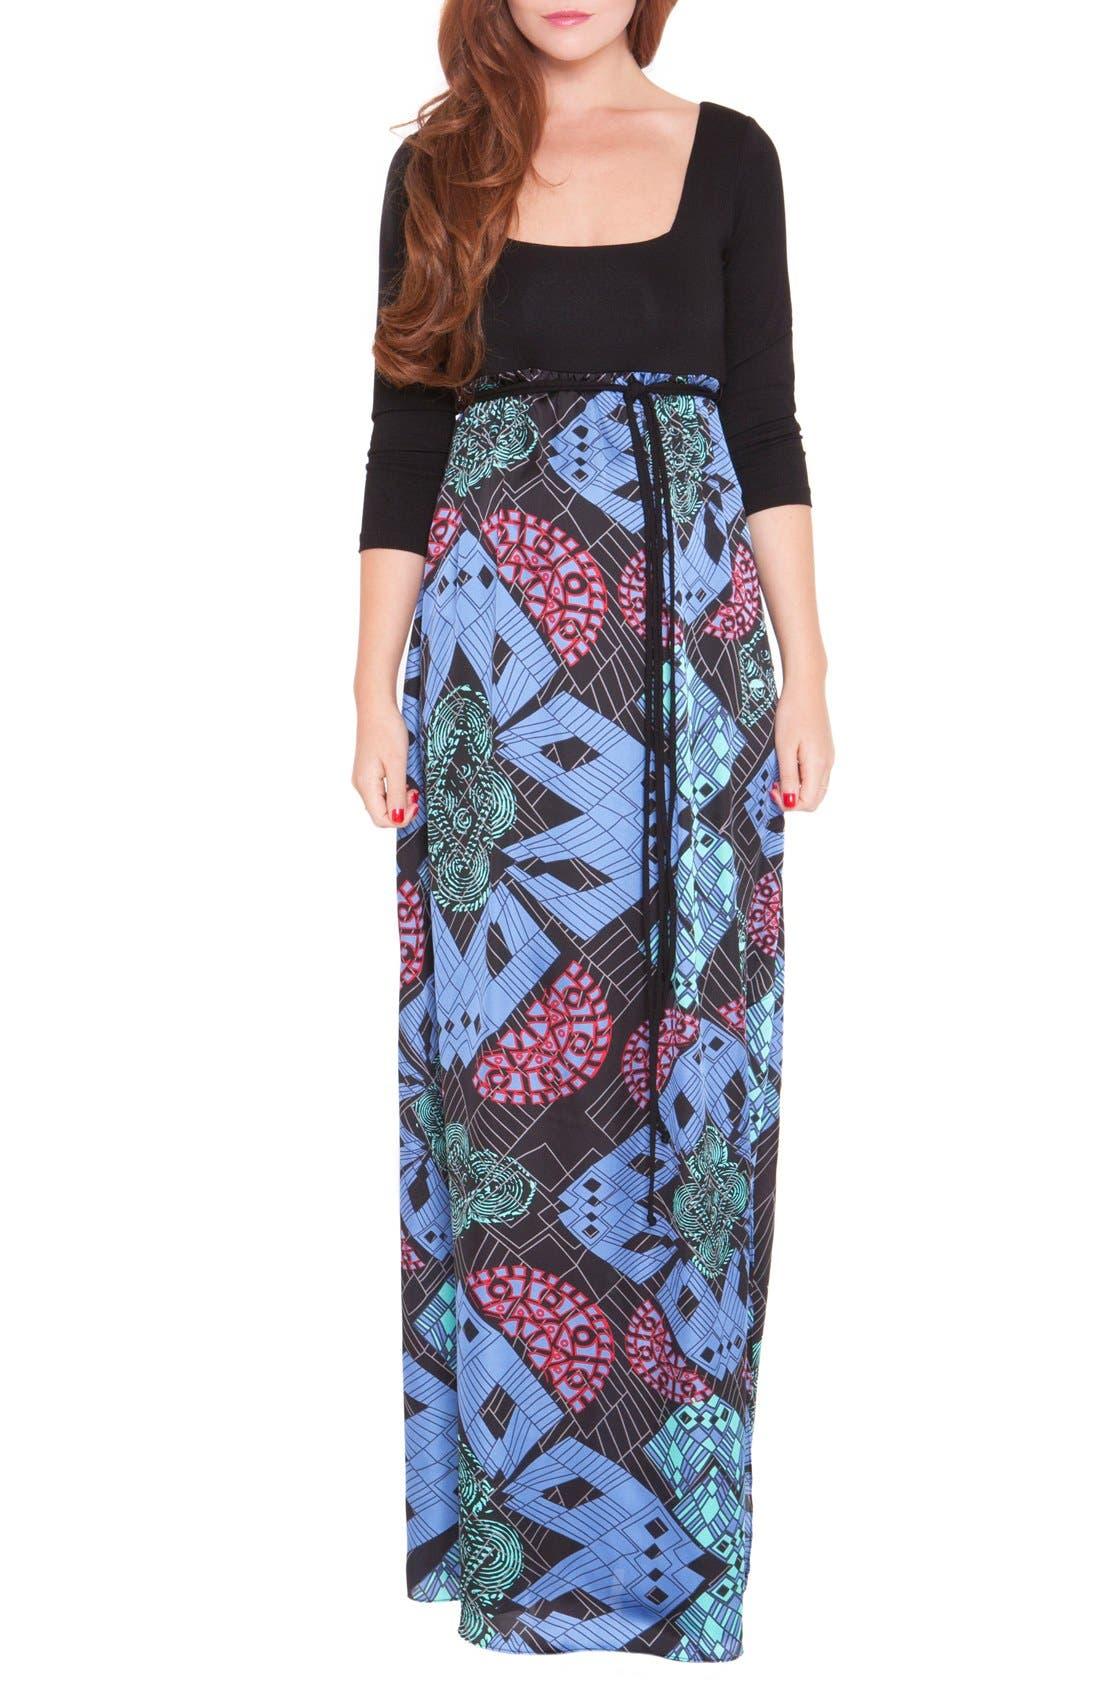 Olian 'Samantha' Maternity Maxi Dress